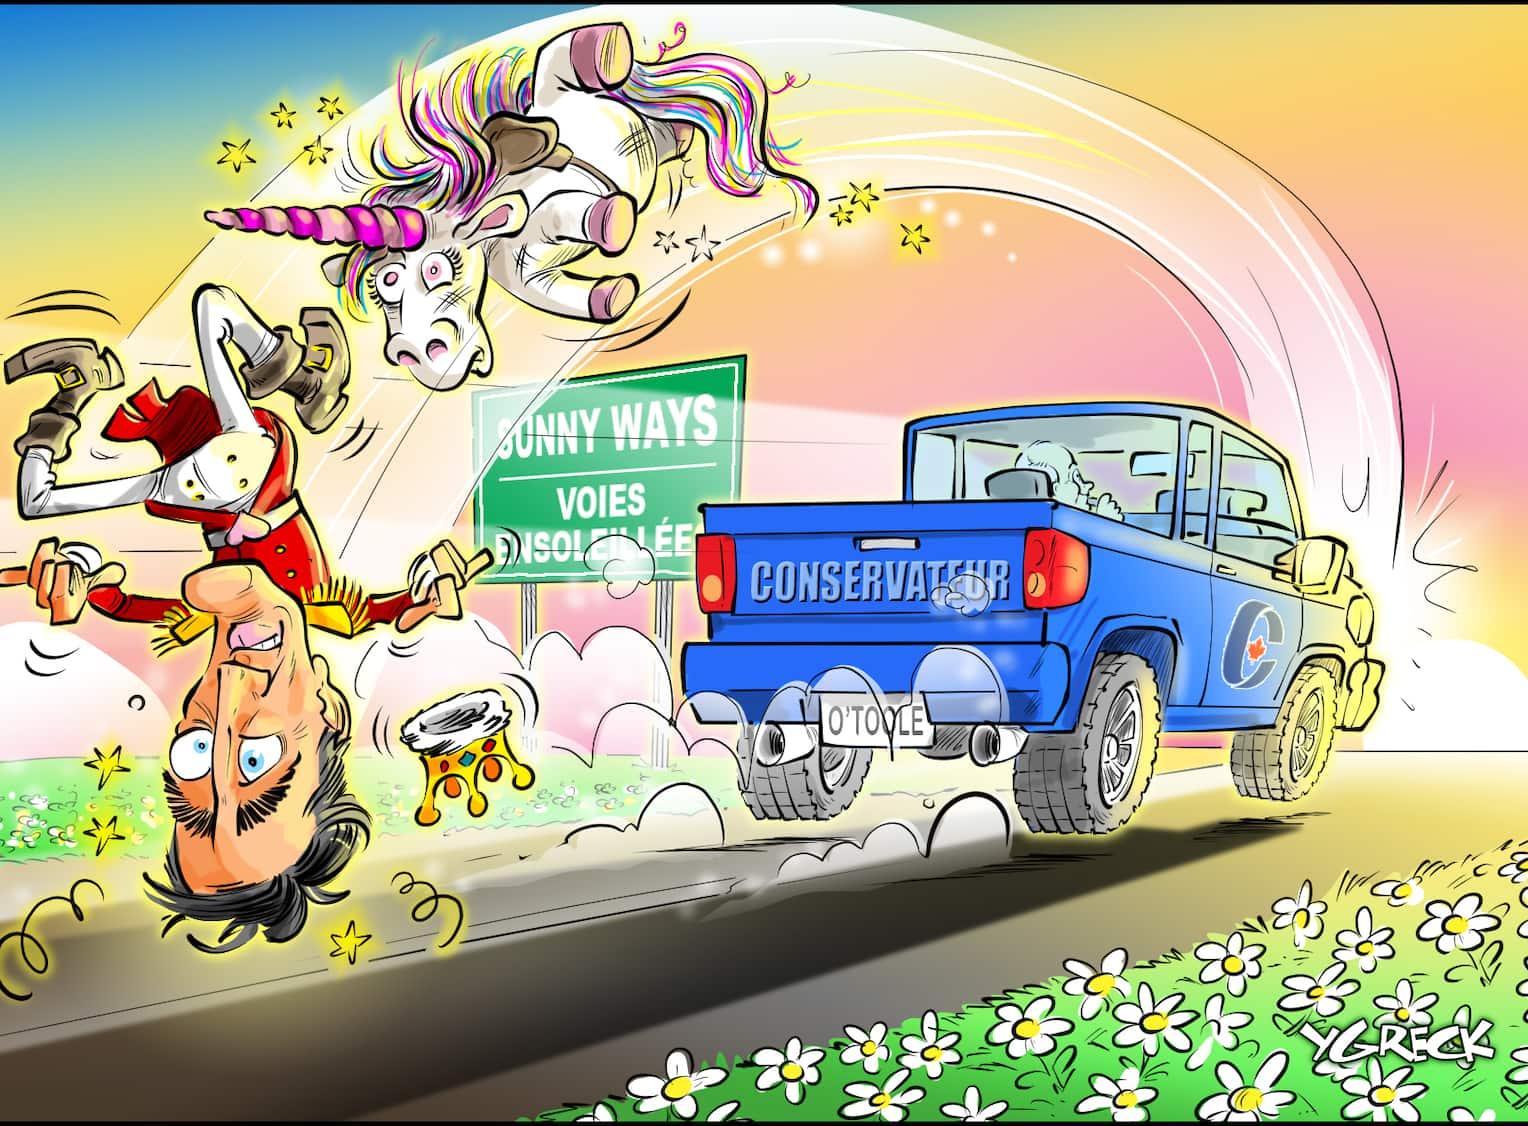 CARICATURES : politiques, judiciaires, sportives ... etc.    (suite 2) - Page 25 Sunny_ways_copiecdabec84-4bd4-4019-bc9e-f9224707769a_ORIGINAL